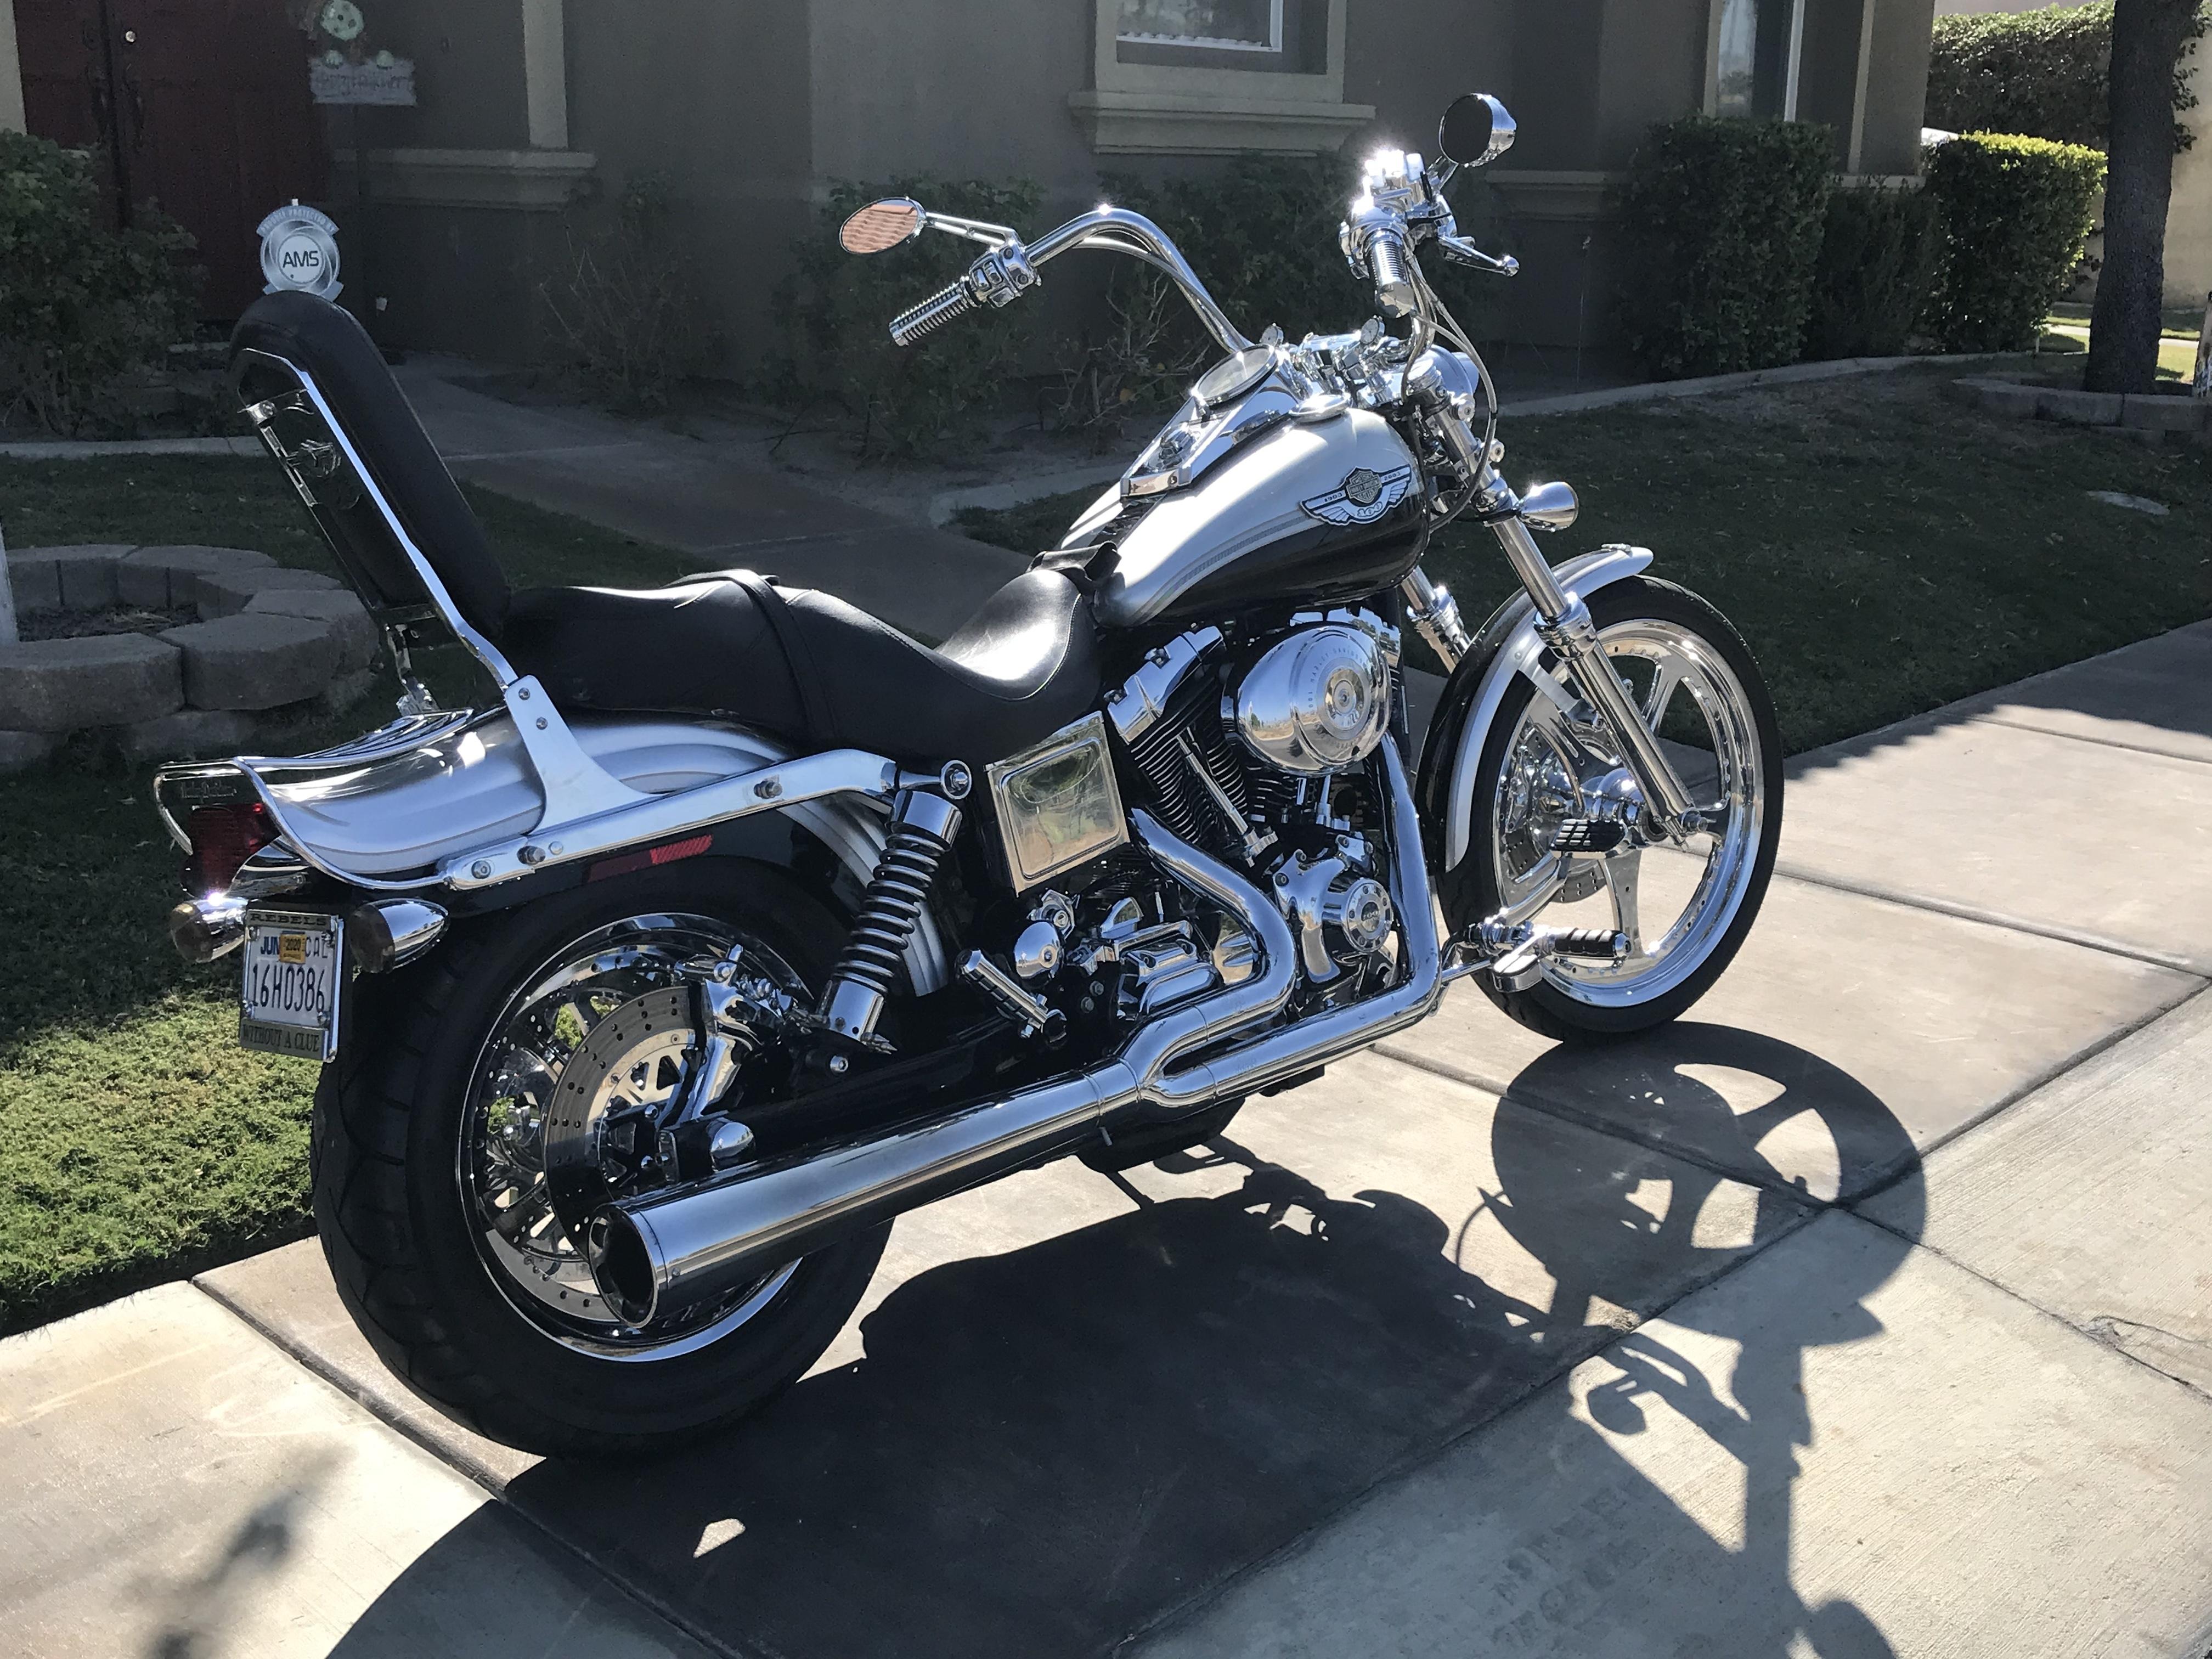 Photo 2003 Harley-Davidson DYNA WIDE GLIDE ANNIVERSARY EDITION $6799172.01172.01